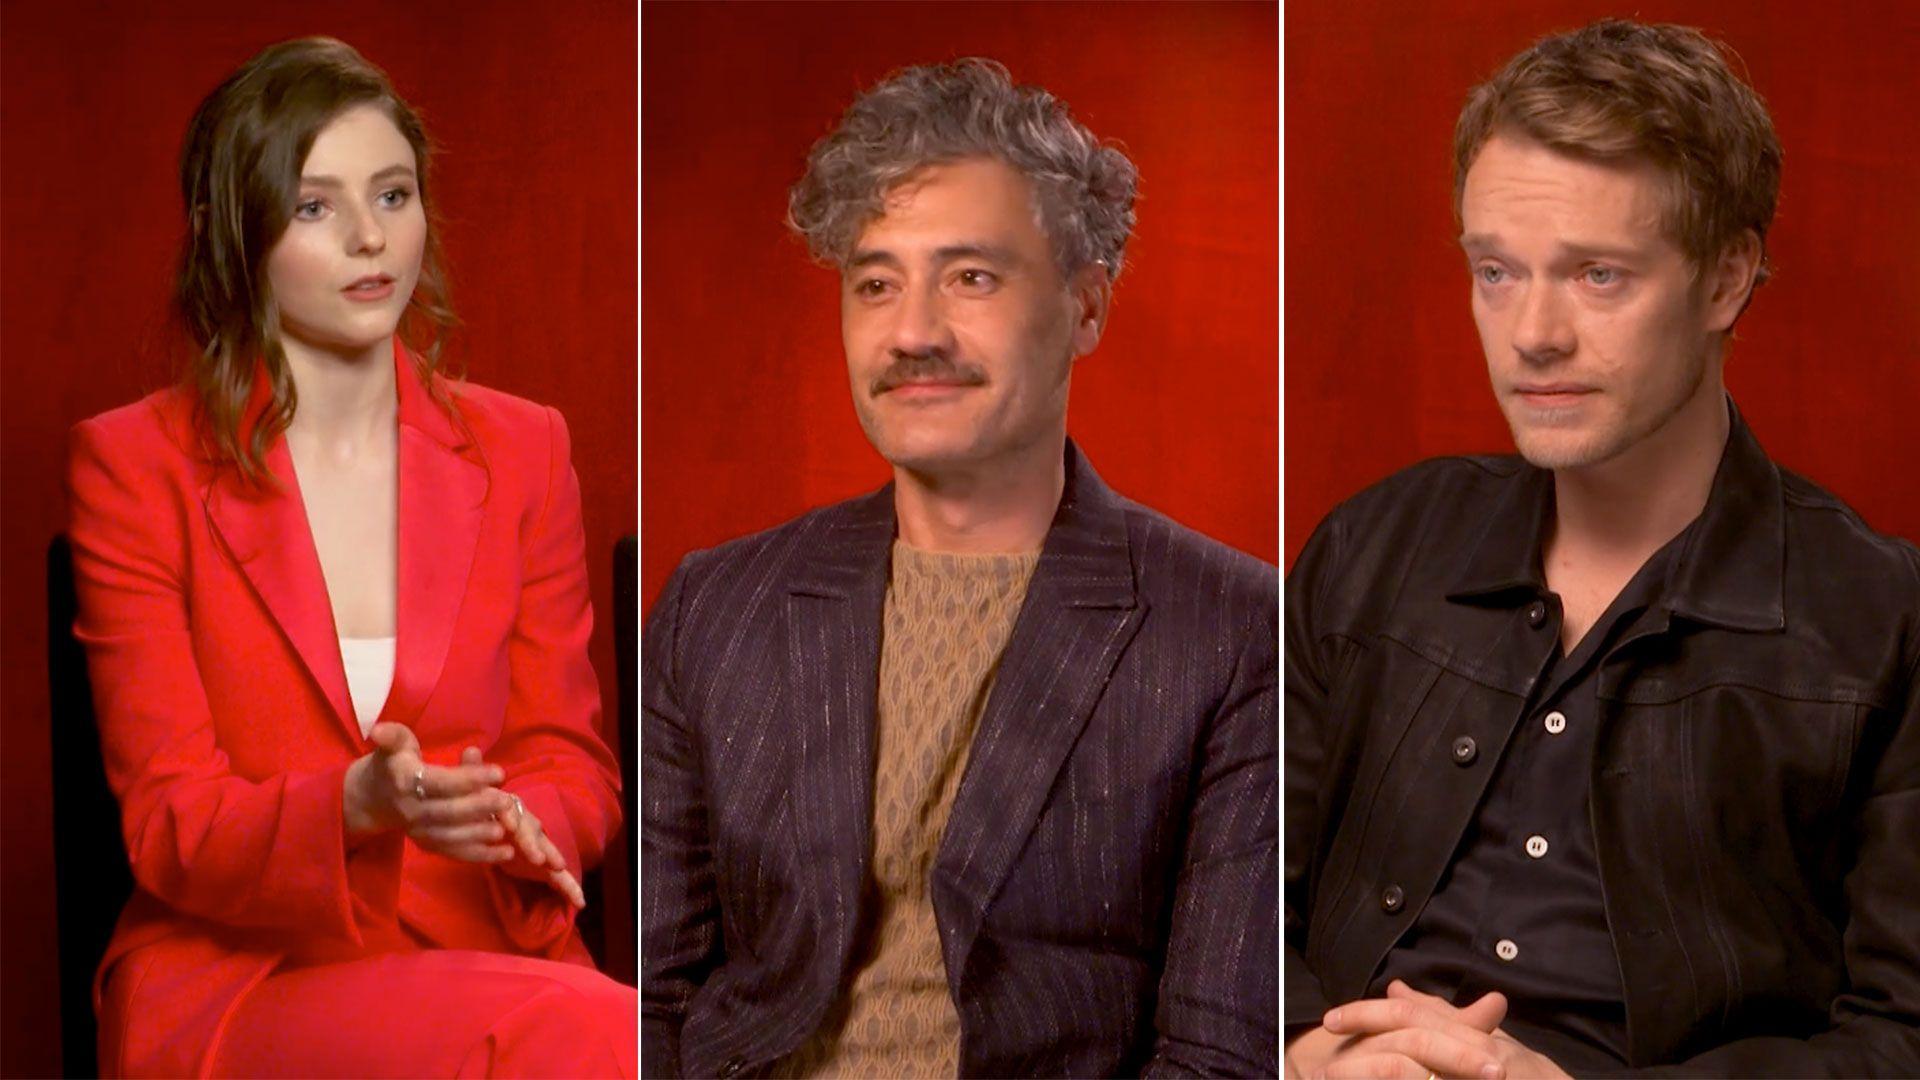 The <i>Thor: Ragnarok</i> director's new film set in Nazi Germany pushes the boundaries of comedy. Jojo Rabbit comes to cinemas on 1 January, 2020.